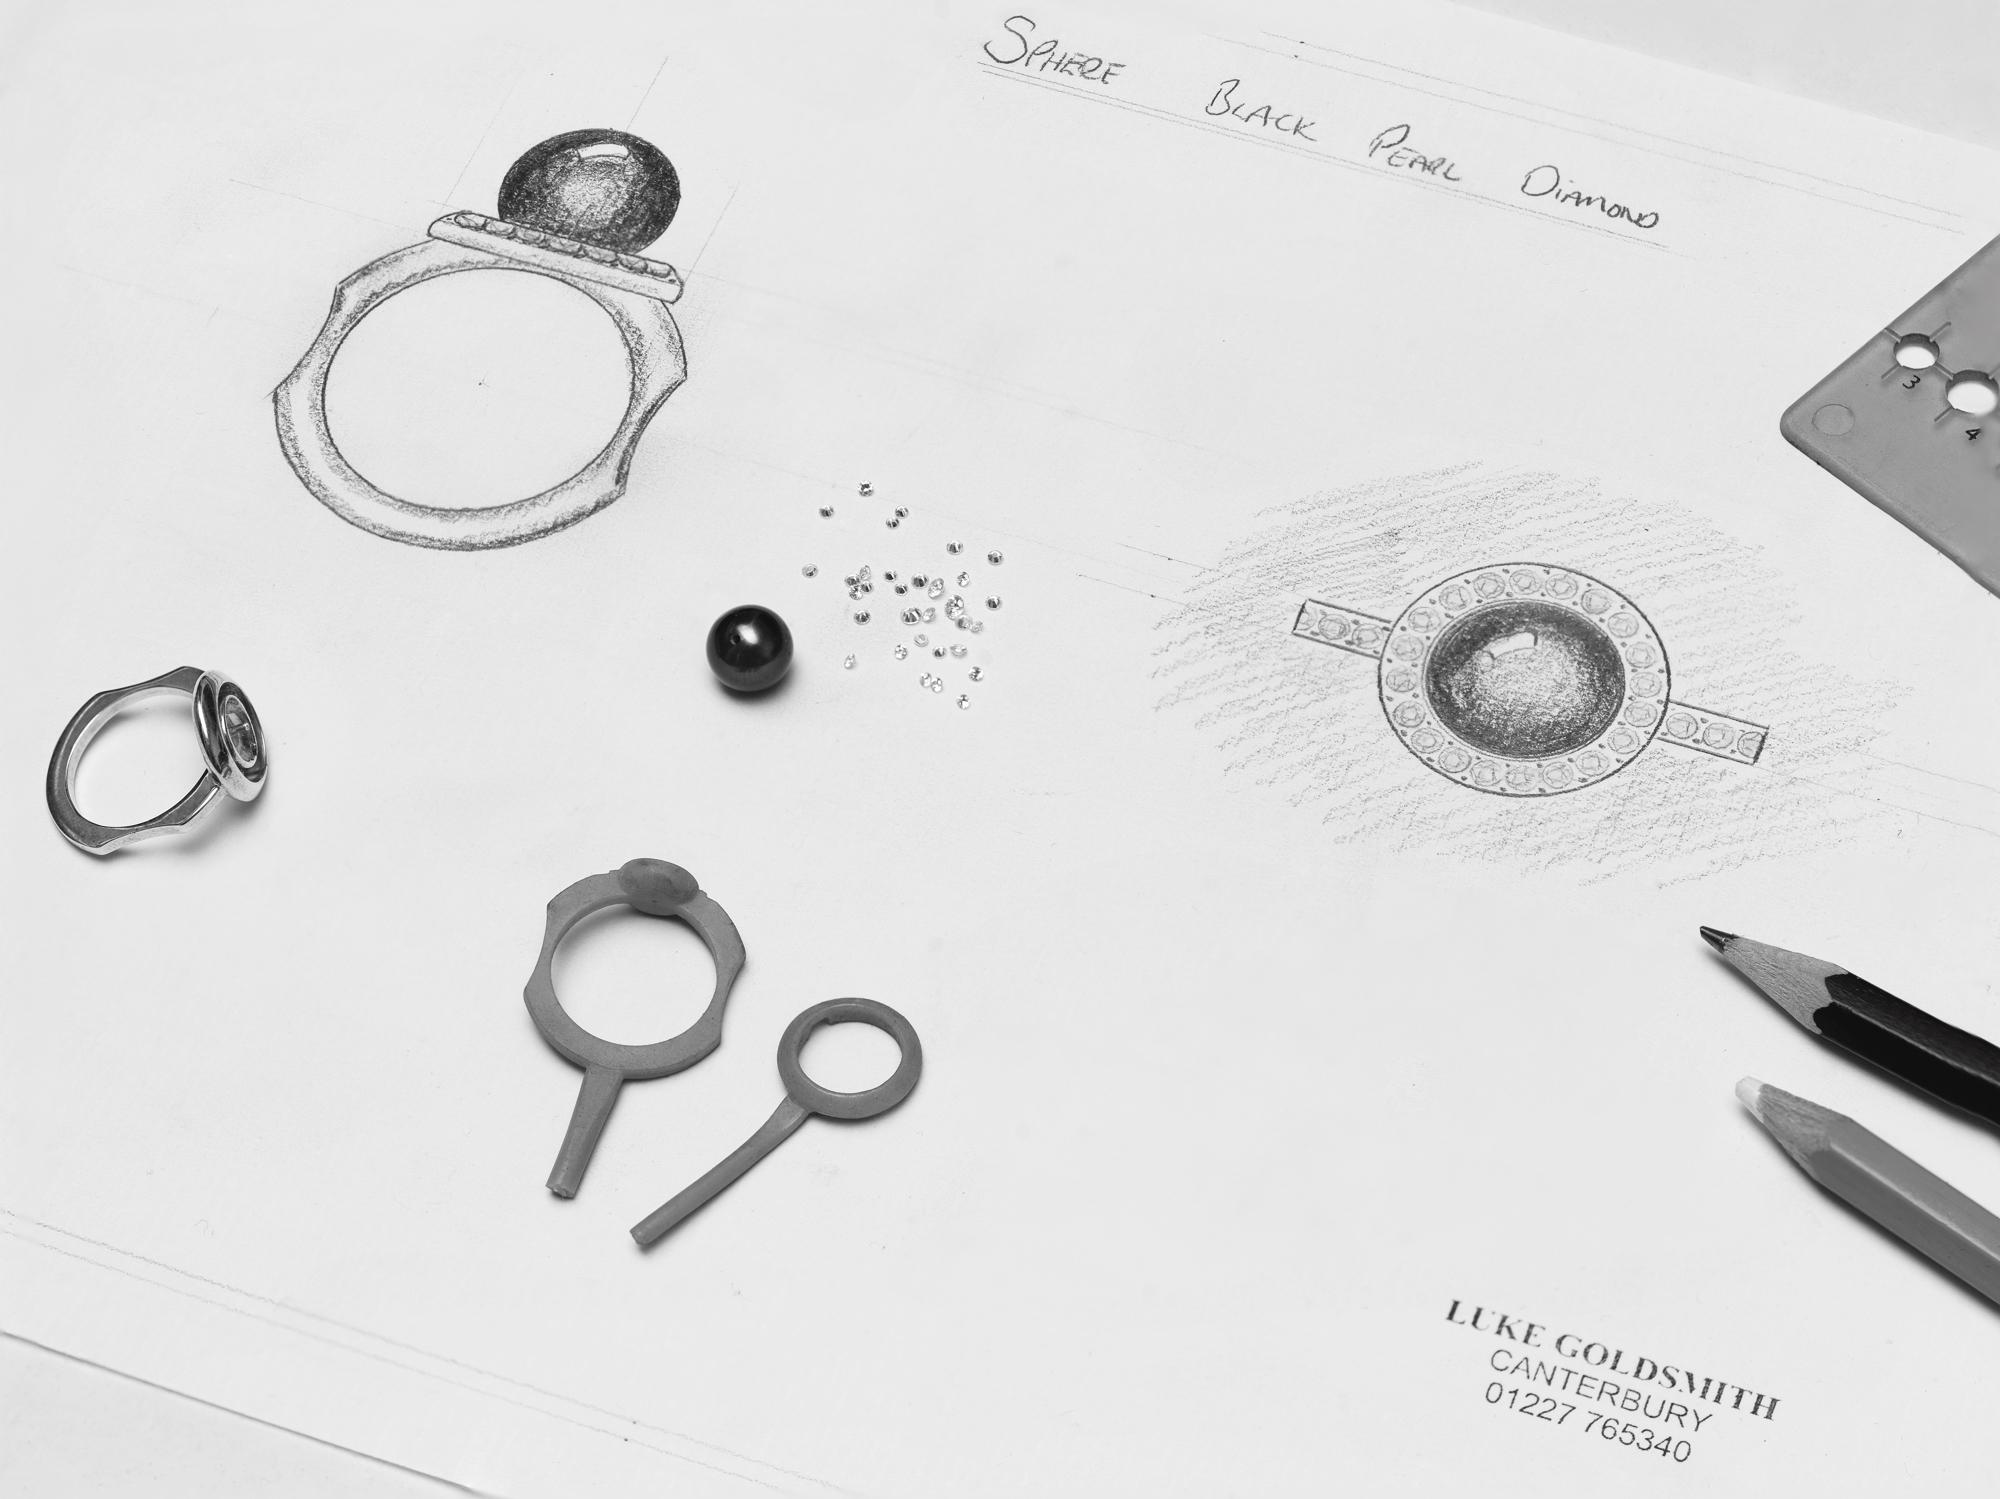 Luke Goldsmith Bespoke Design